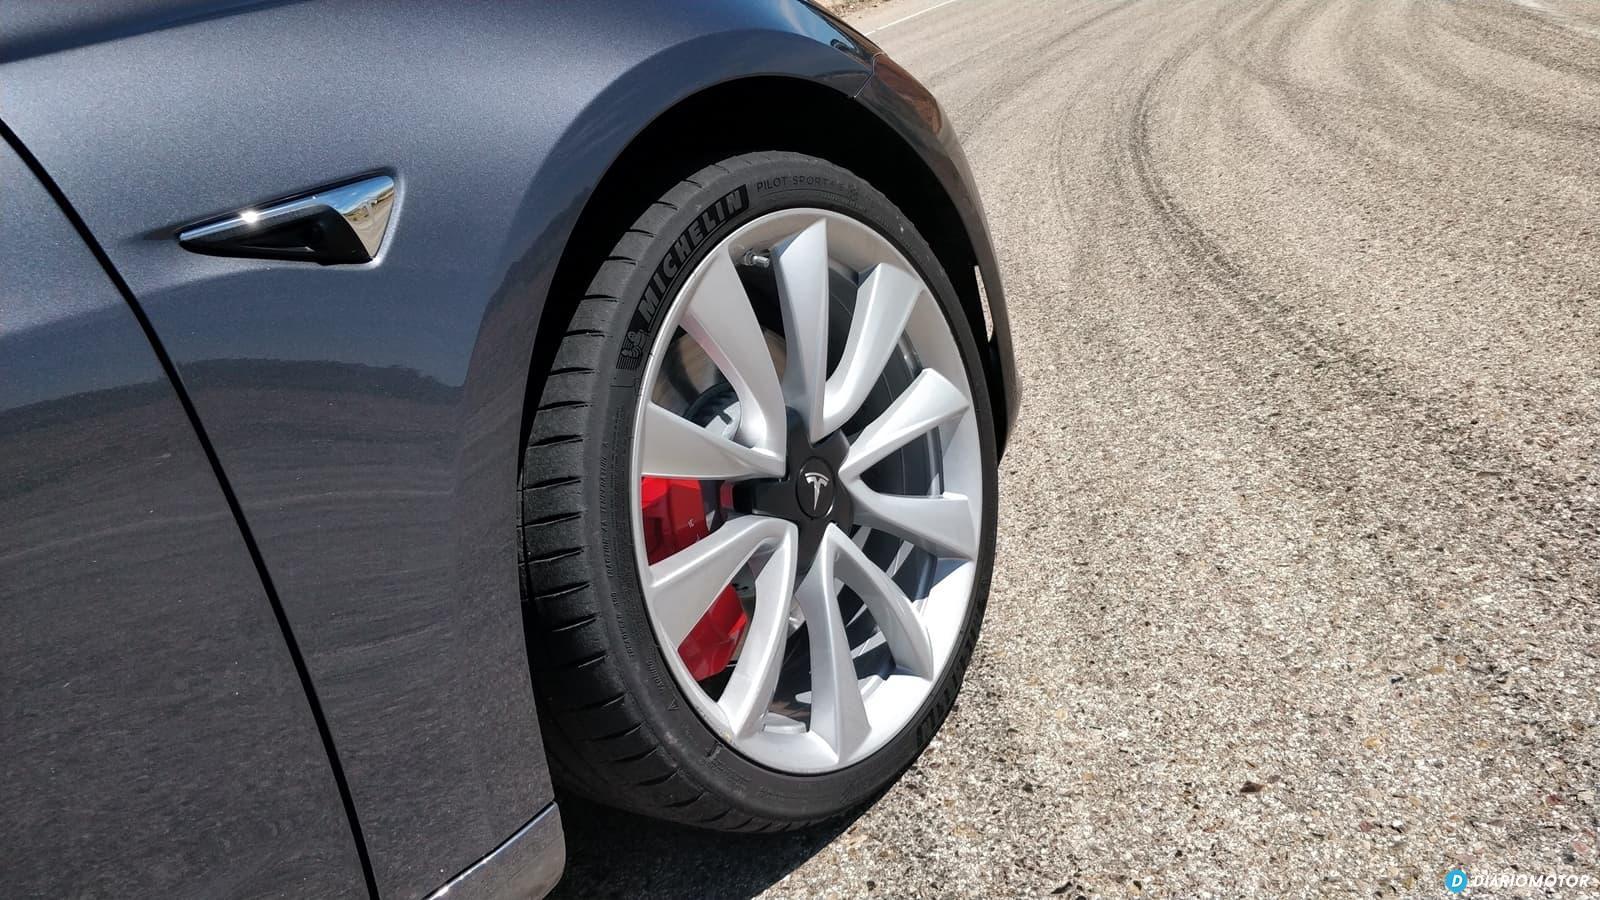 Tesla Model 3 Vs Alfa Romeo Giulia Quadrifoglio 0619 030